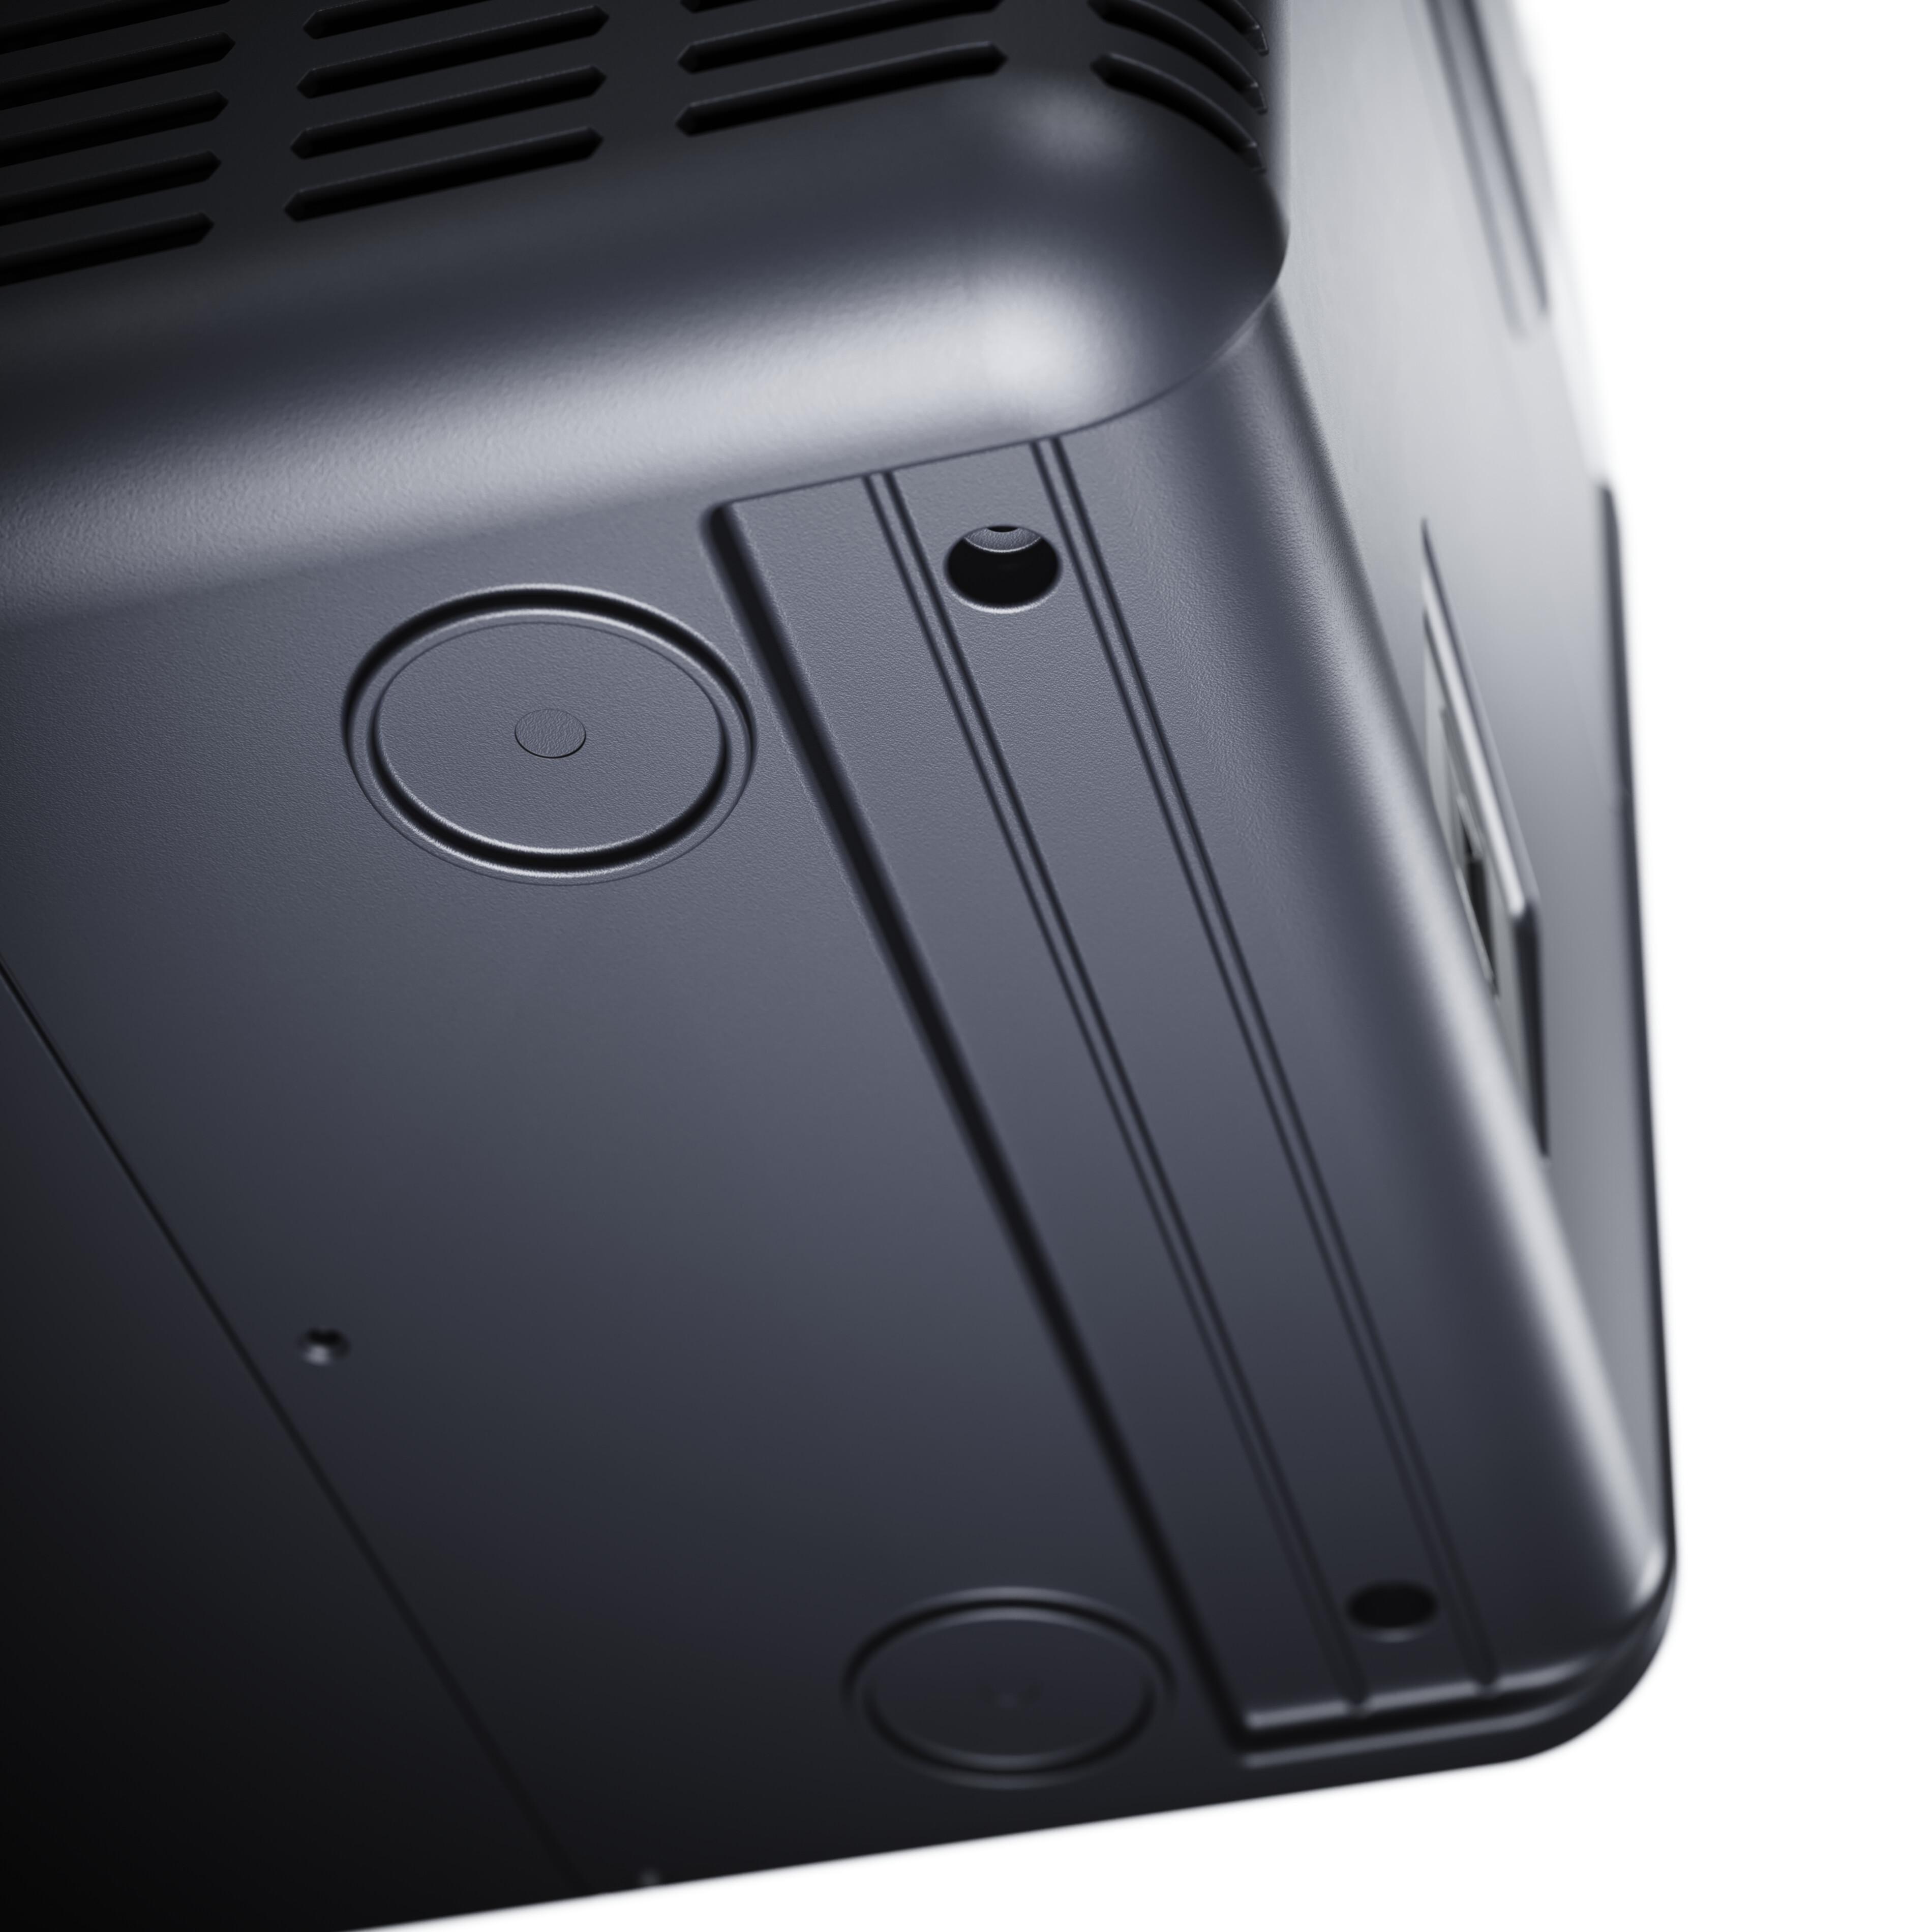 Dometic Waeco CoolFreeze CDF2-36 Kompressor Kühlbox Kühltruhe Kühlschrank 12 24V